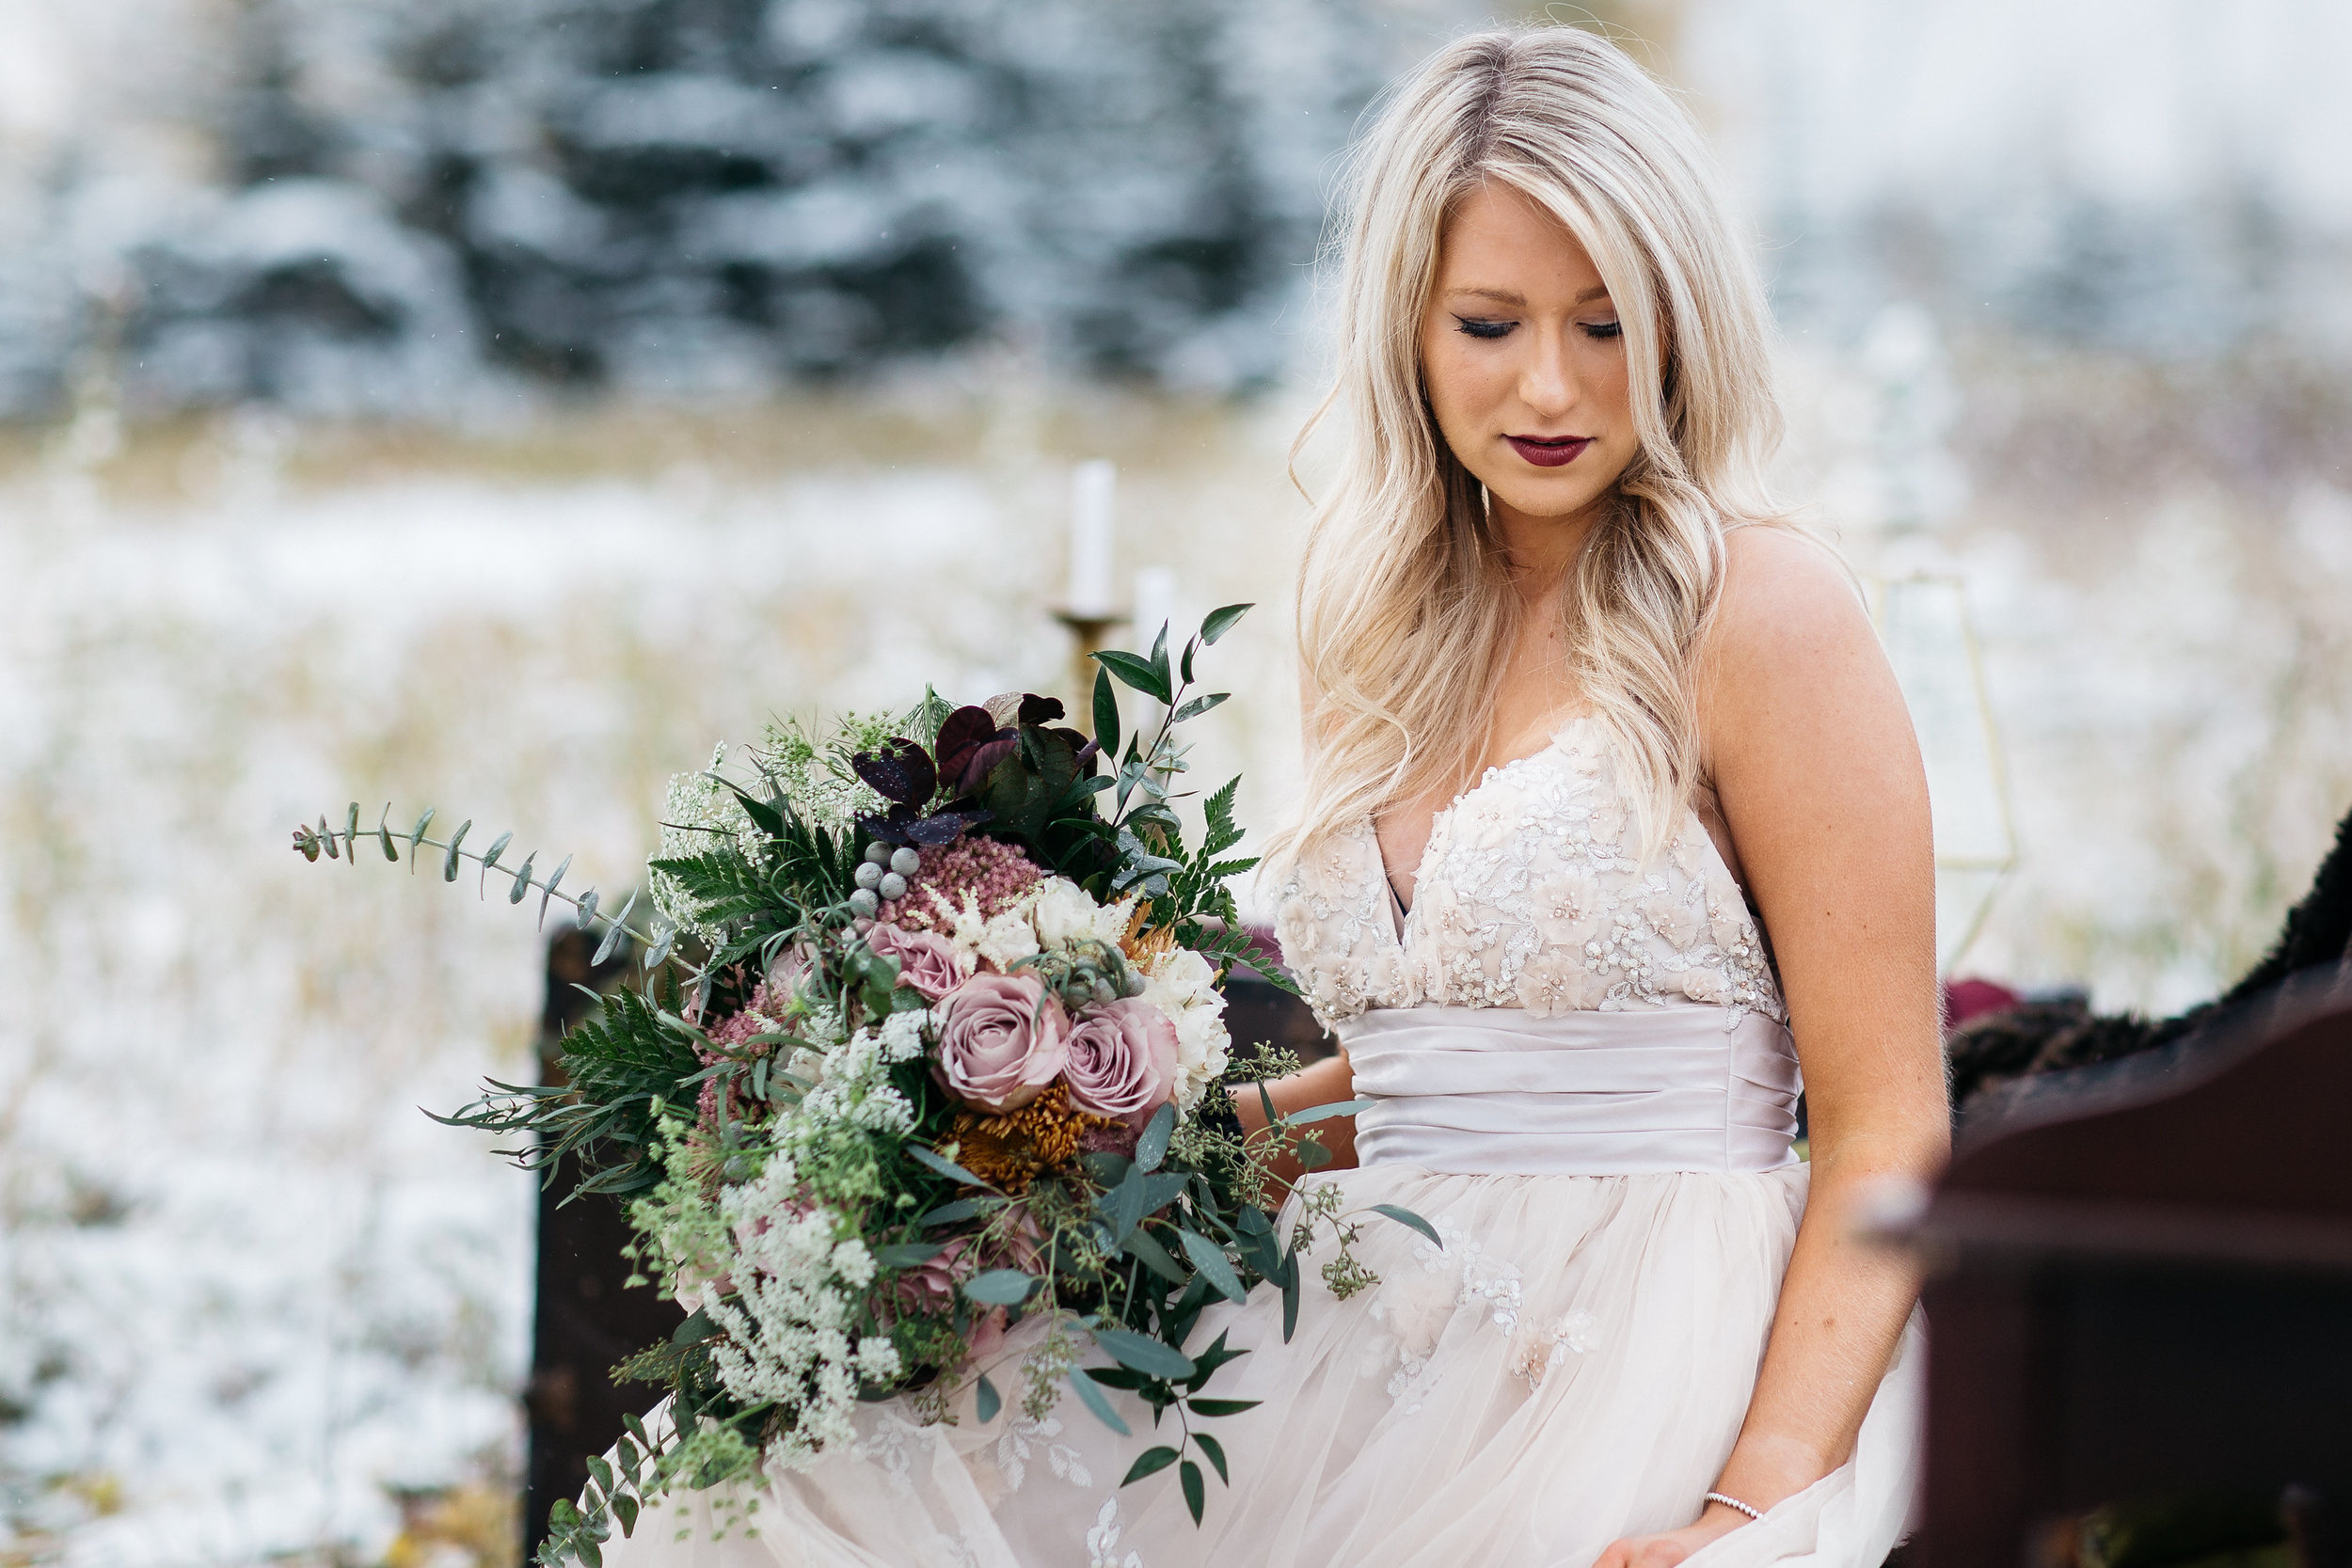 bridal bouquets in calgary, alberta